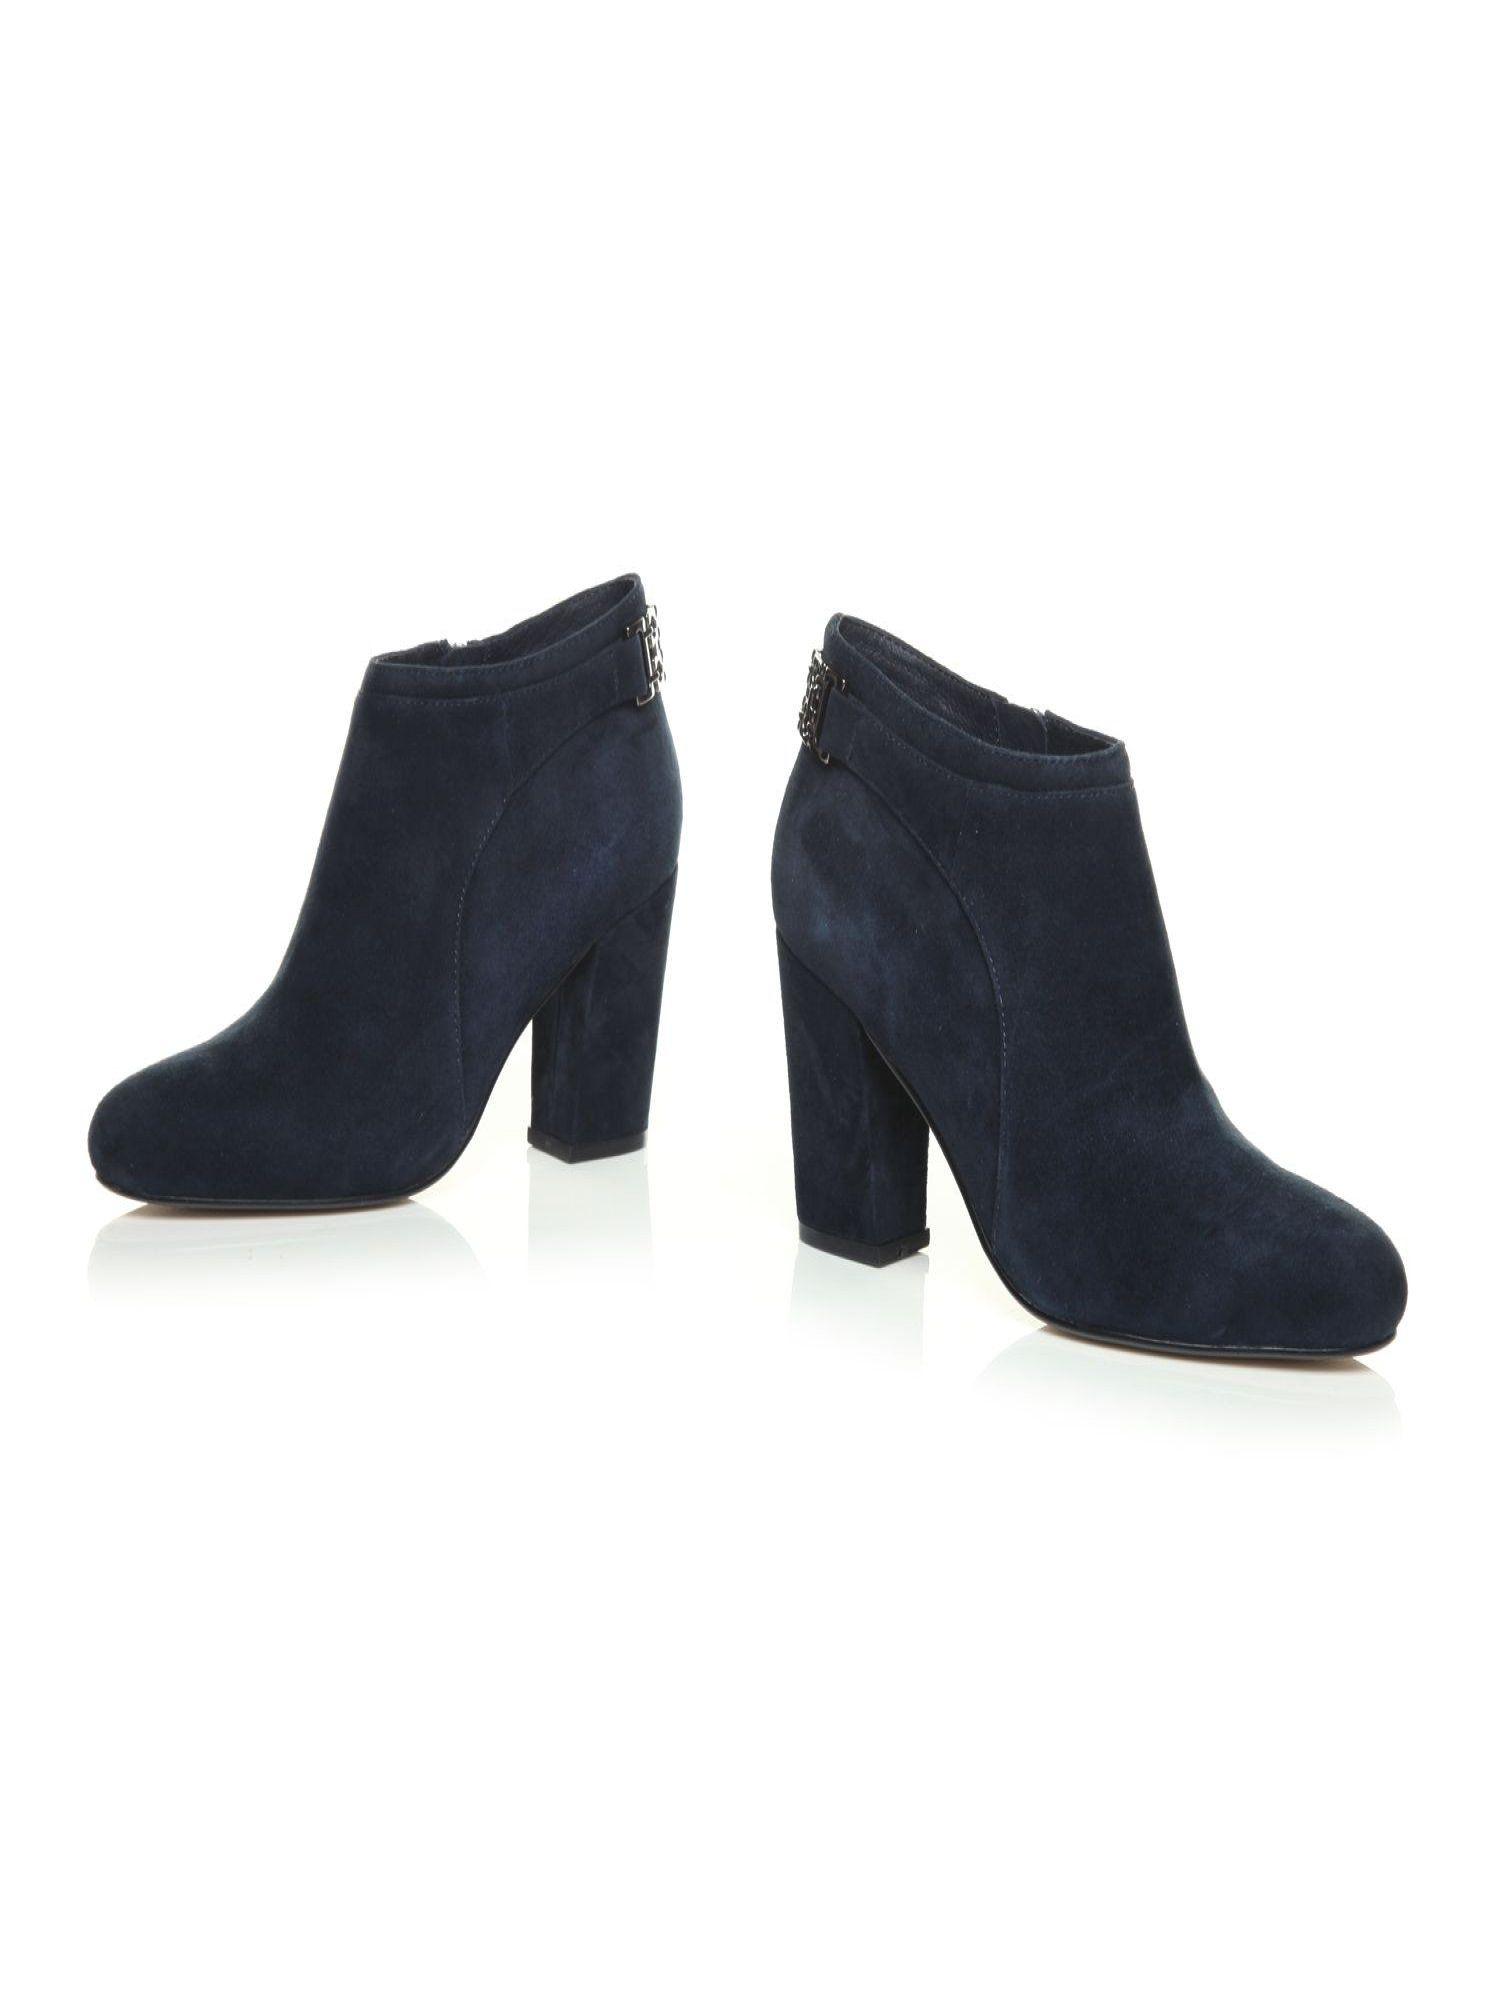 Lyst Lyst Lyst Moda In Pelle Kadina High Smart Short Stiefel in Blau b3ee0b